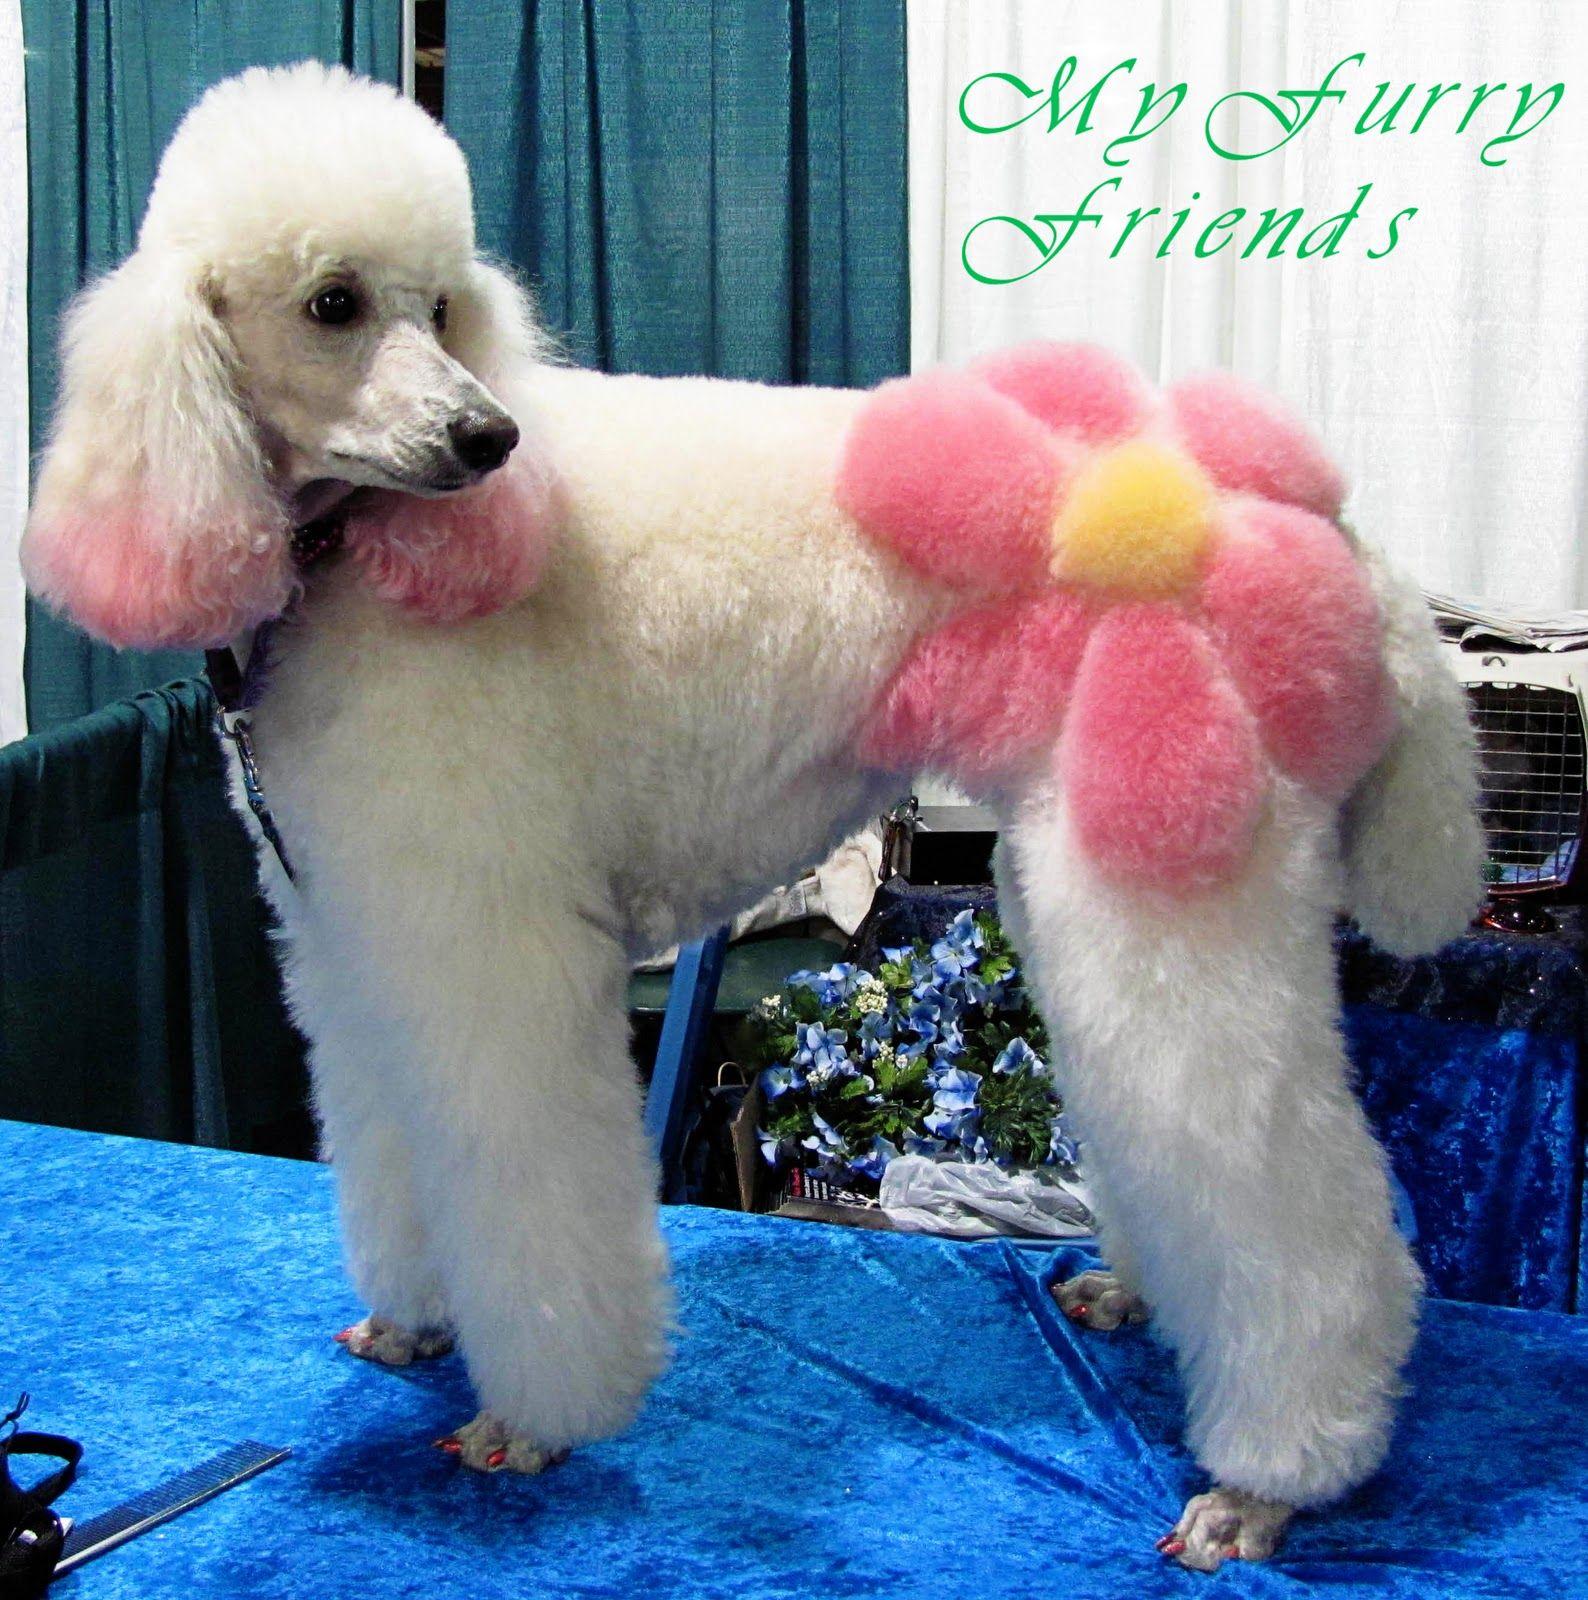 Colored poodle photo